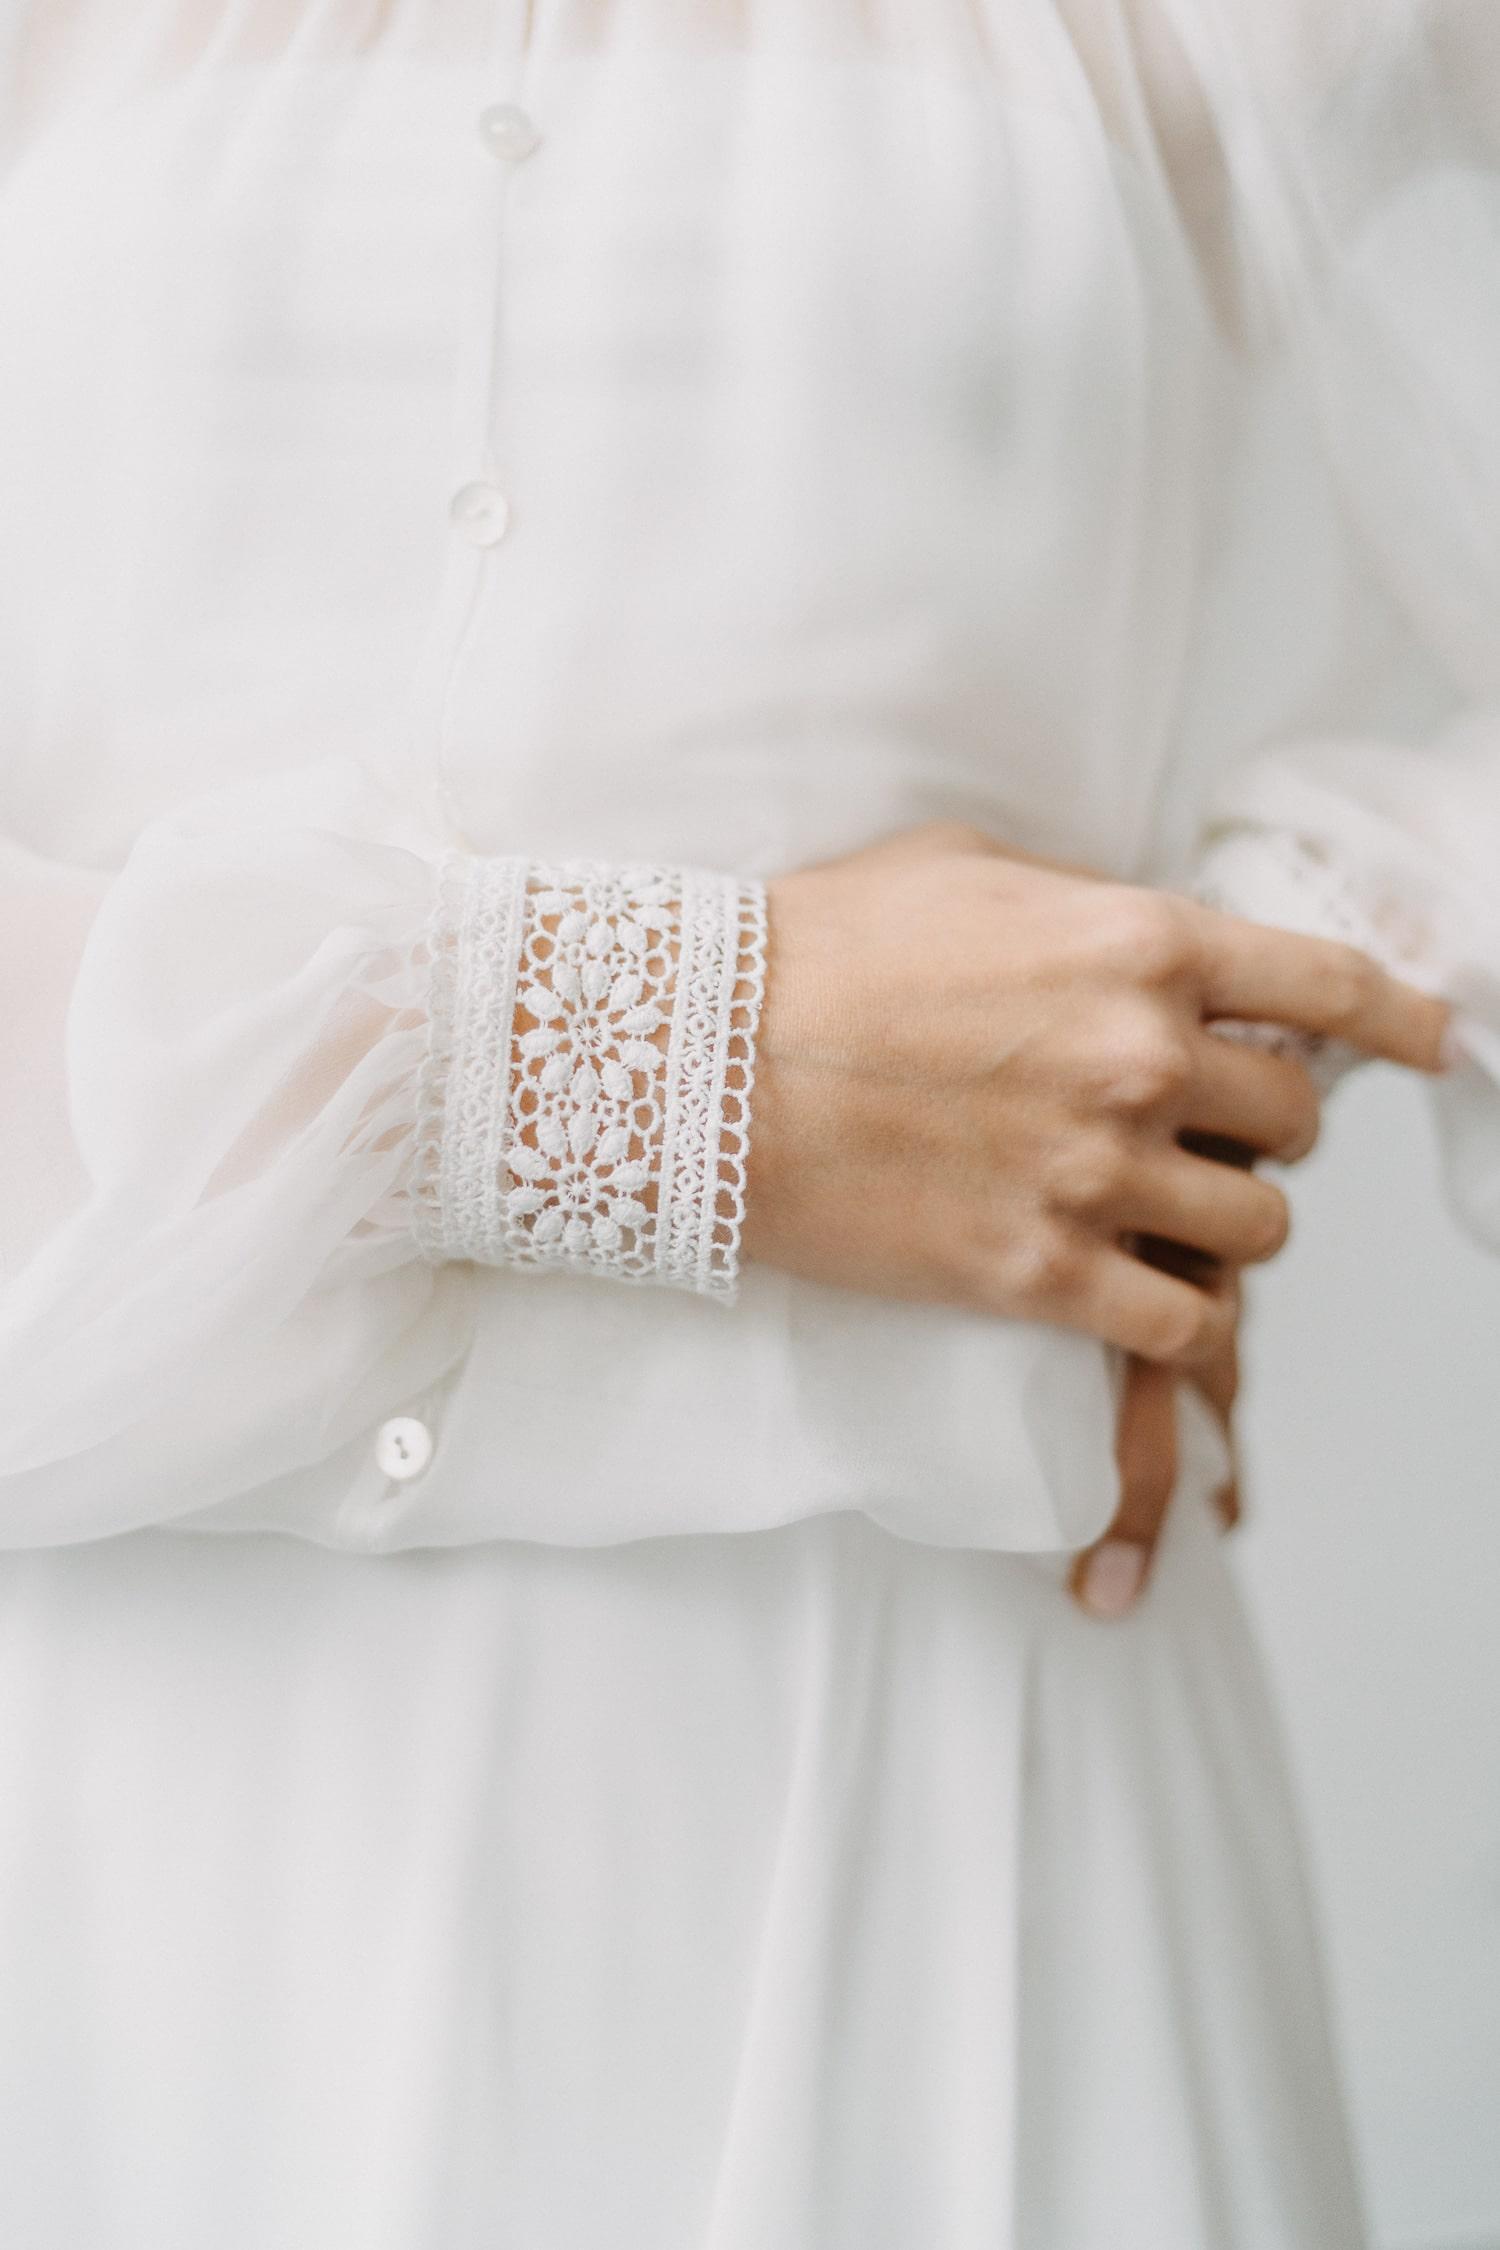 2021 Claudia Heller Brautmode Brautkleid Amber 4 min – gesehen bei frauimmer-herrewig.de